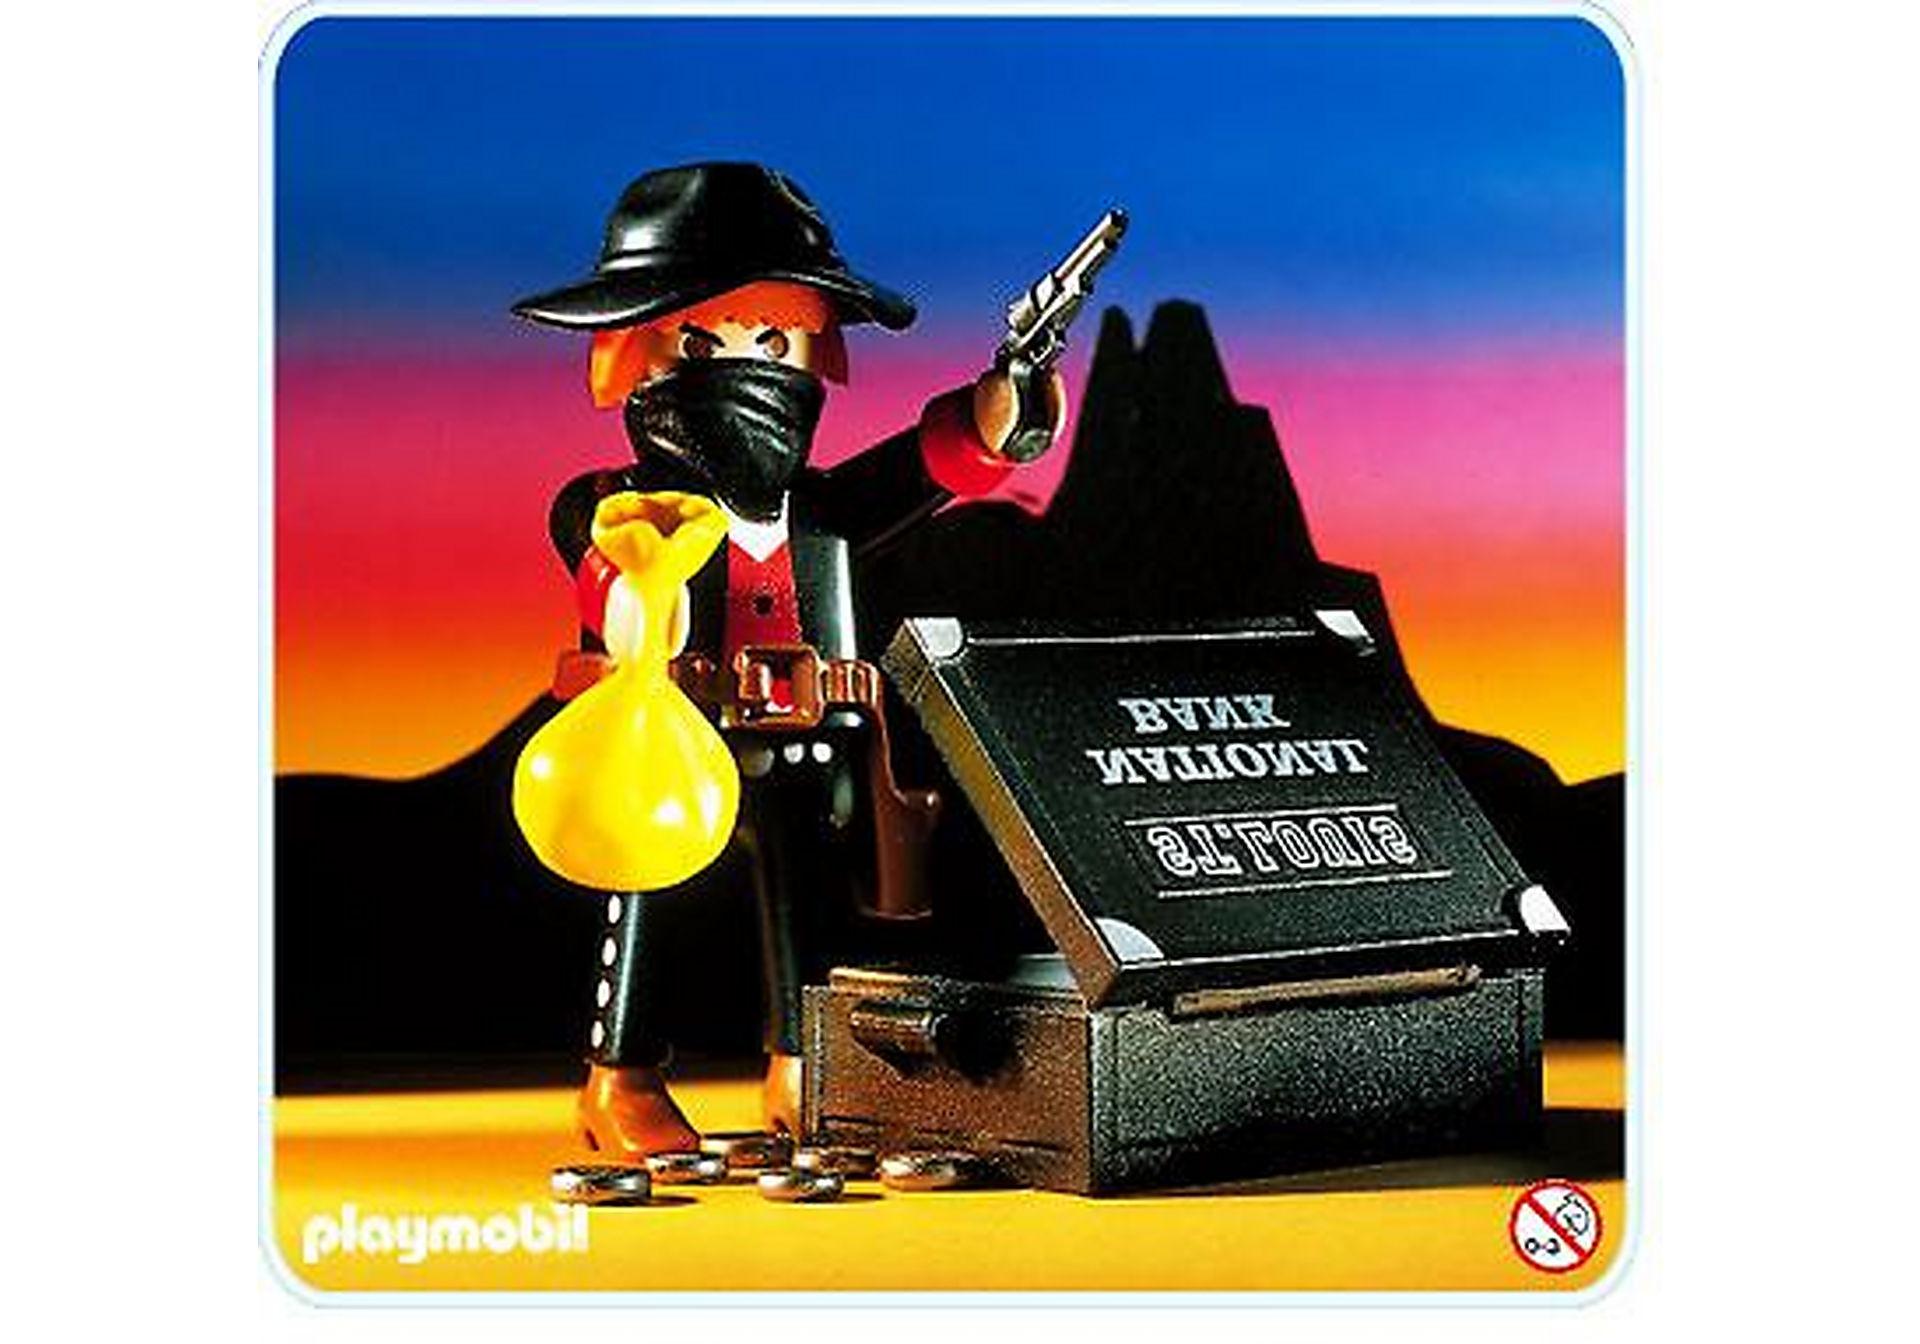 http://media.playmobil.com/i/playmobil/3814-A_product_detail/Bandit